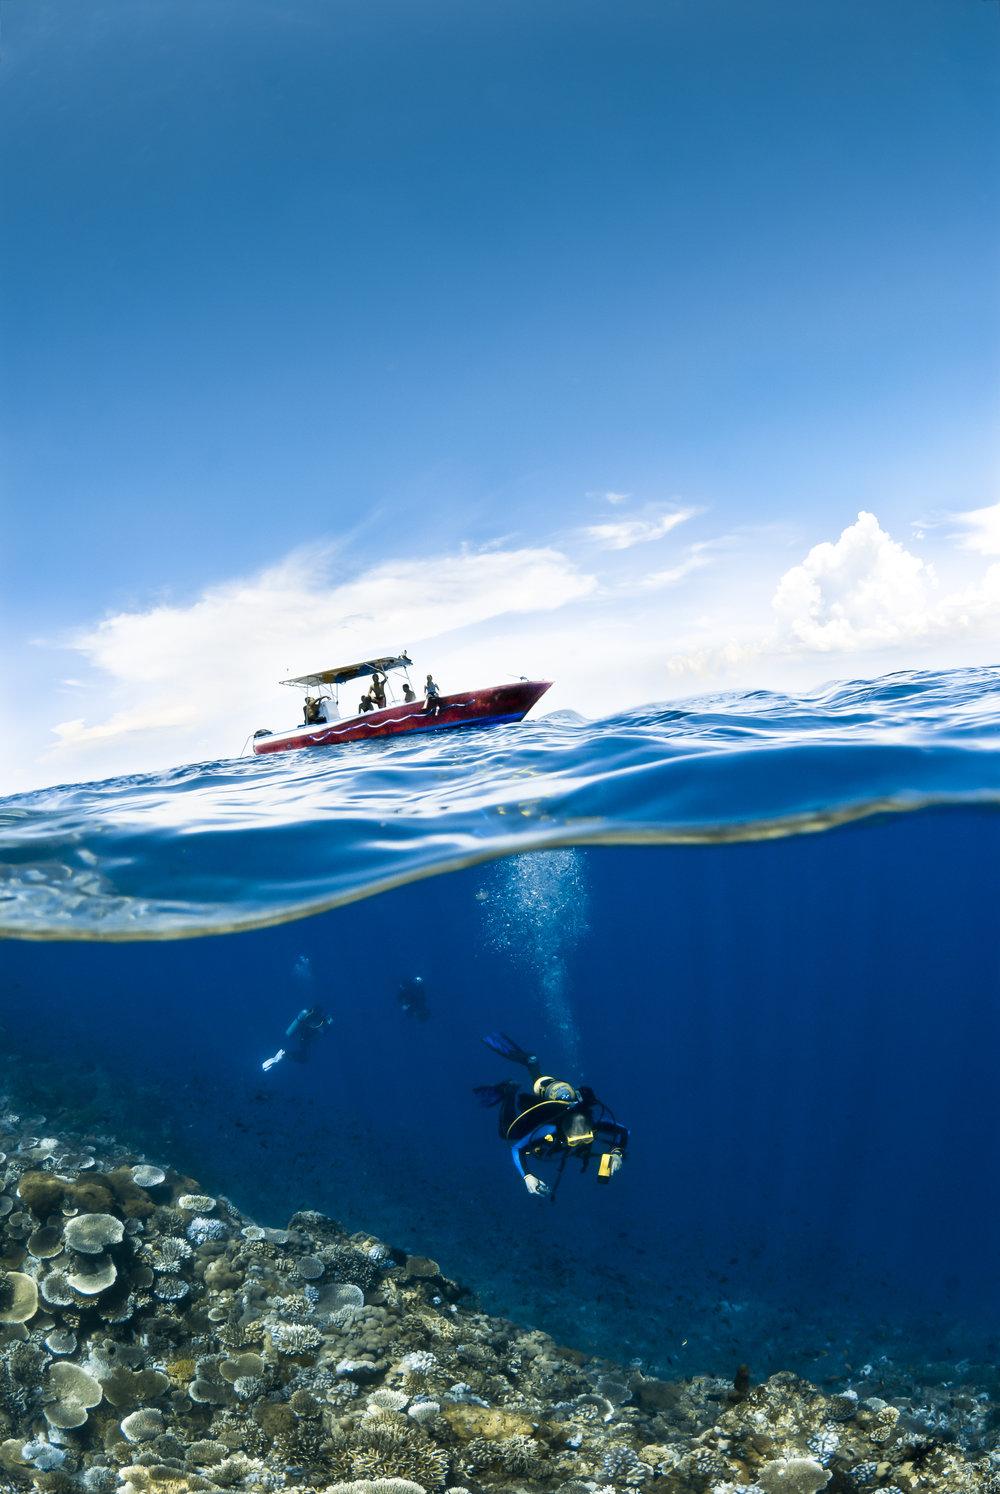 Verde Island Split-Shot (various Acropora) credit: alex tyrrell / coral reef image bank